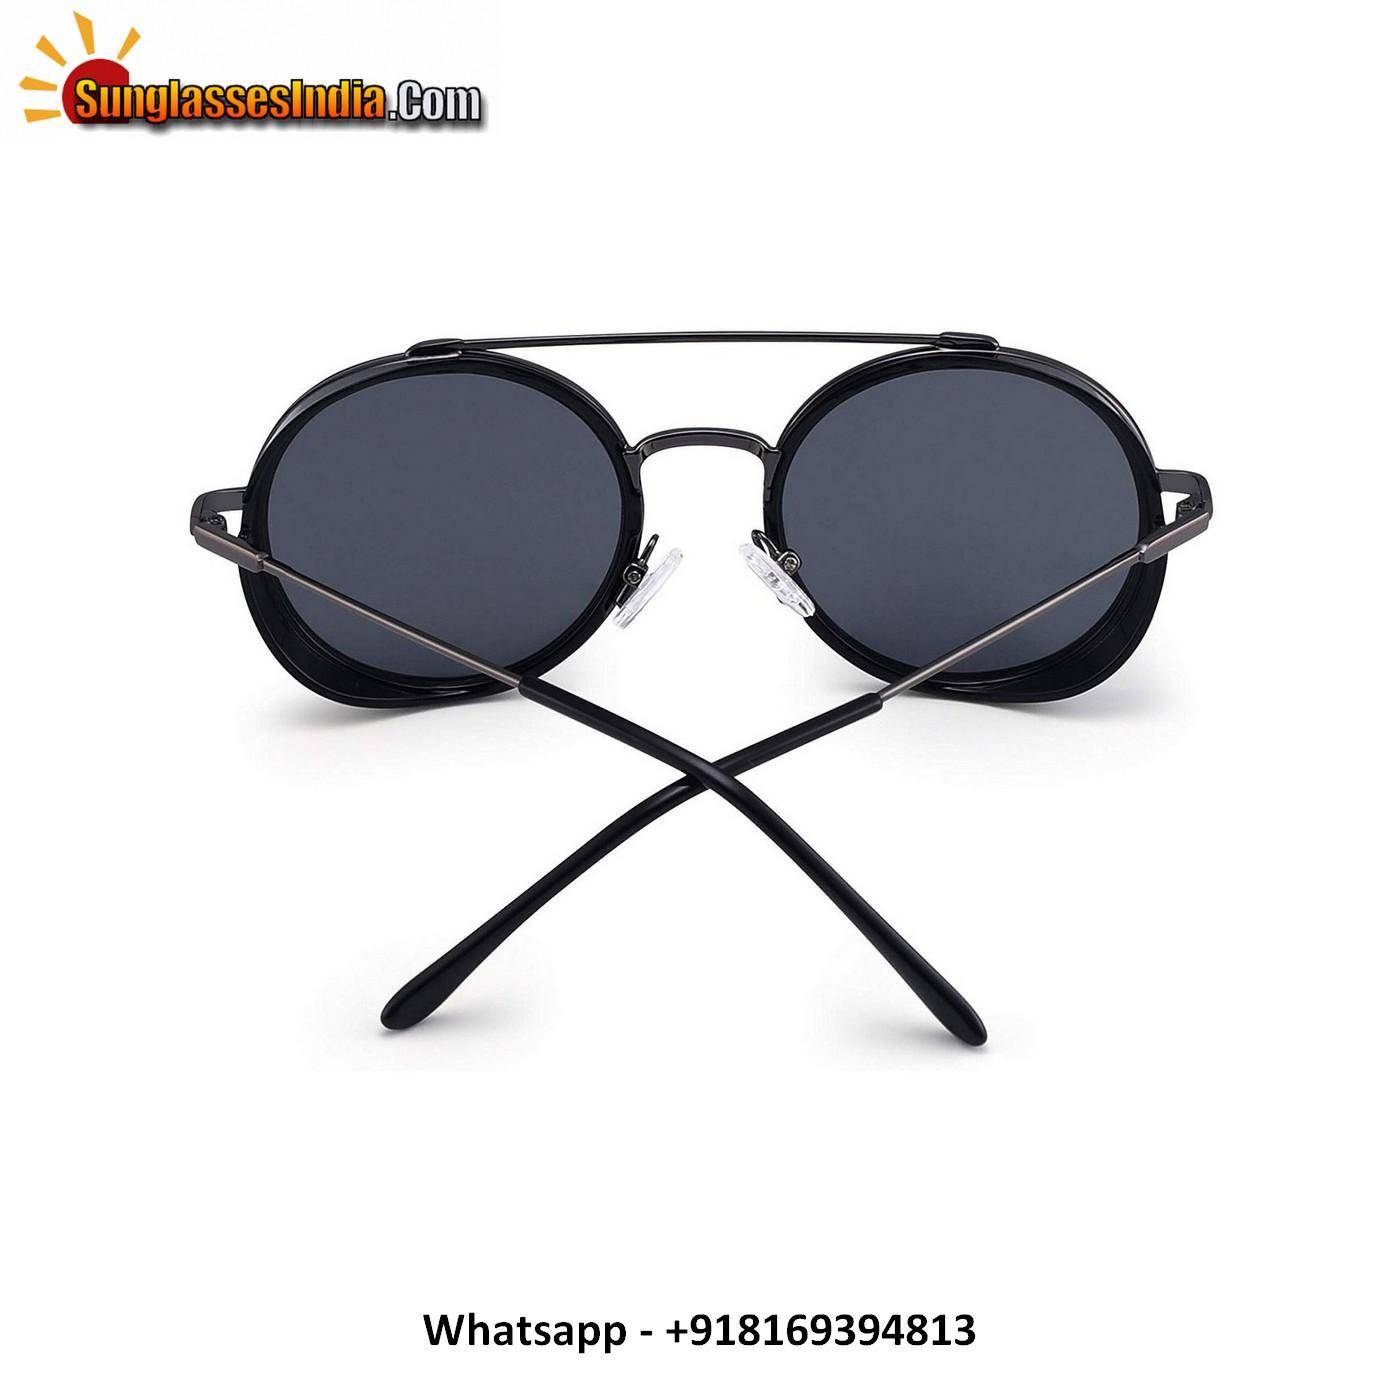 Retro Round Steampunk Sunglasses for Women Men Circle Lens Metal Frame